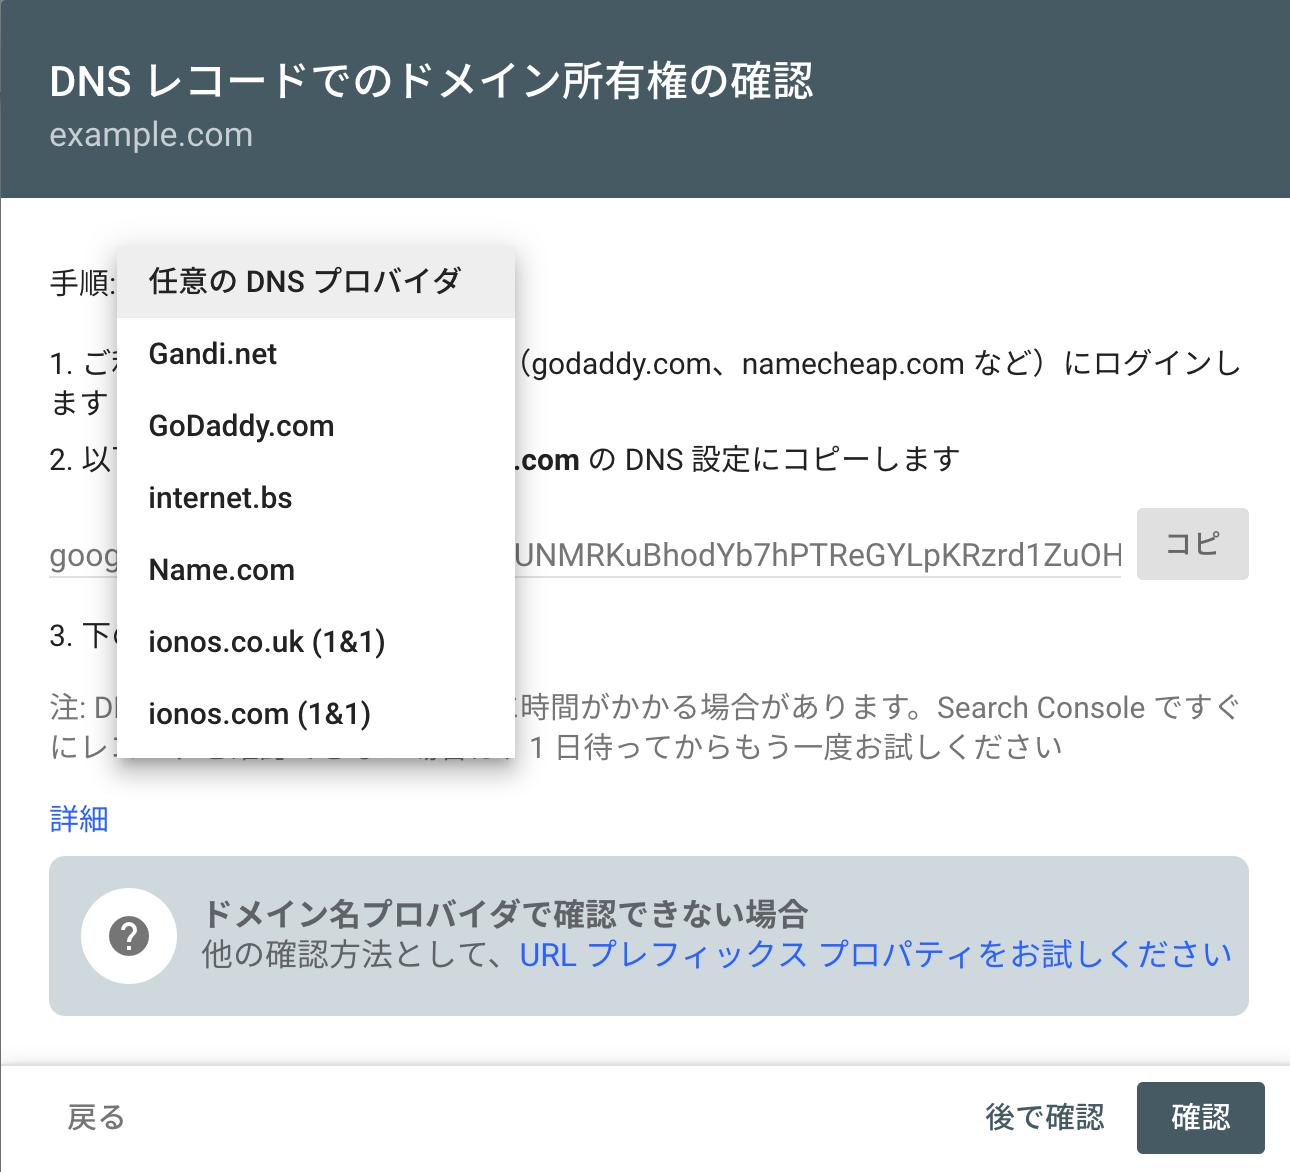 DNS レコードでのドメイン所有権の確認